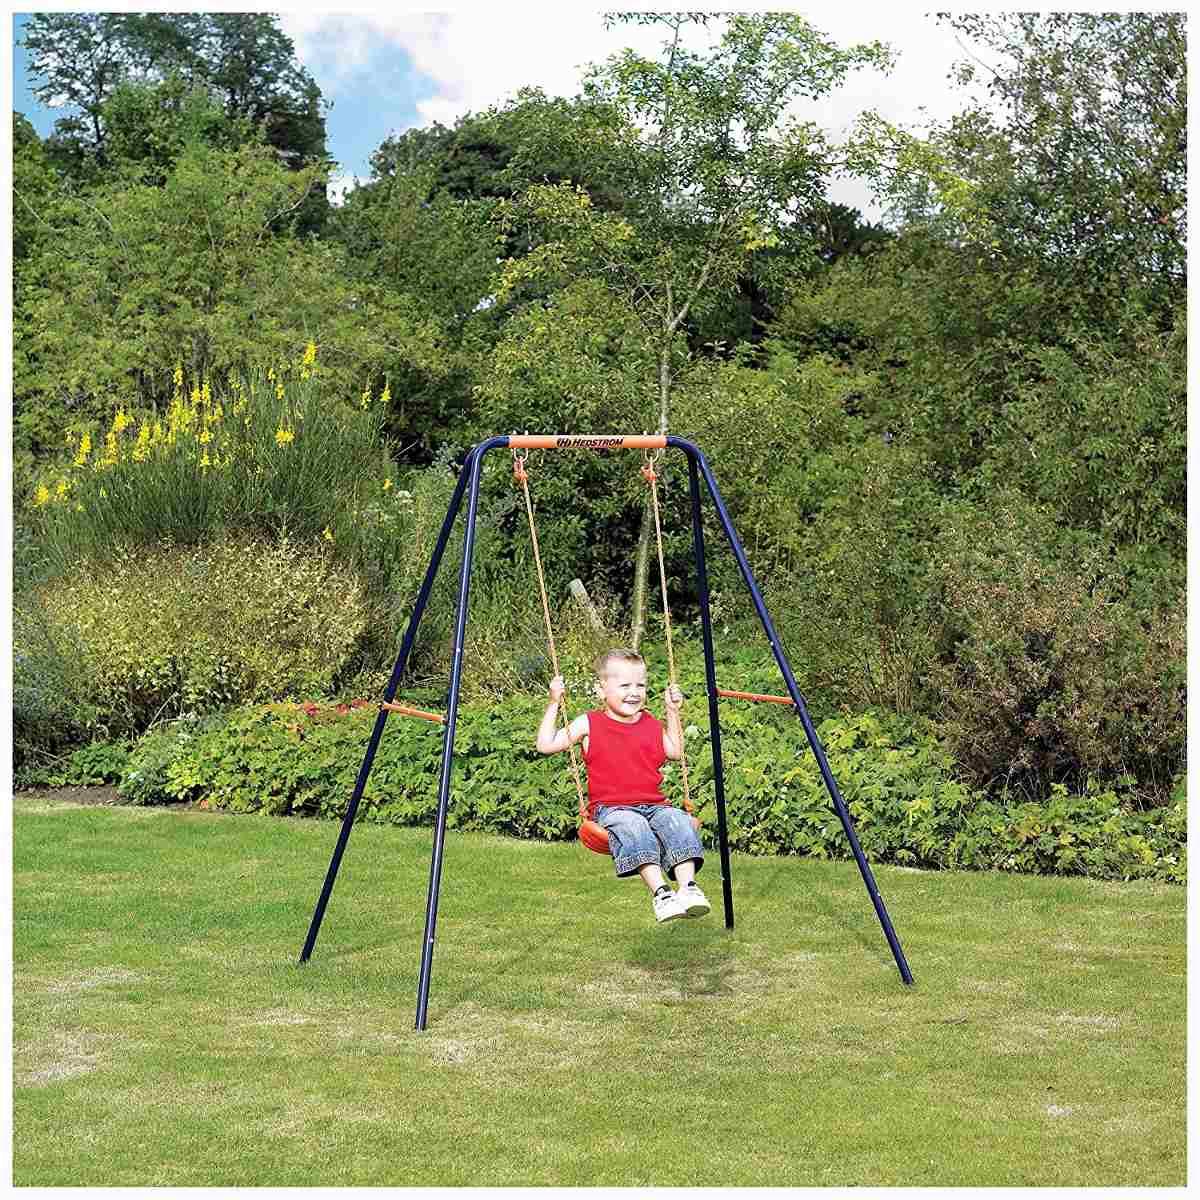 Columpio individual infantil ni o jugar patio jardin - Columpios ninos jardin ...